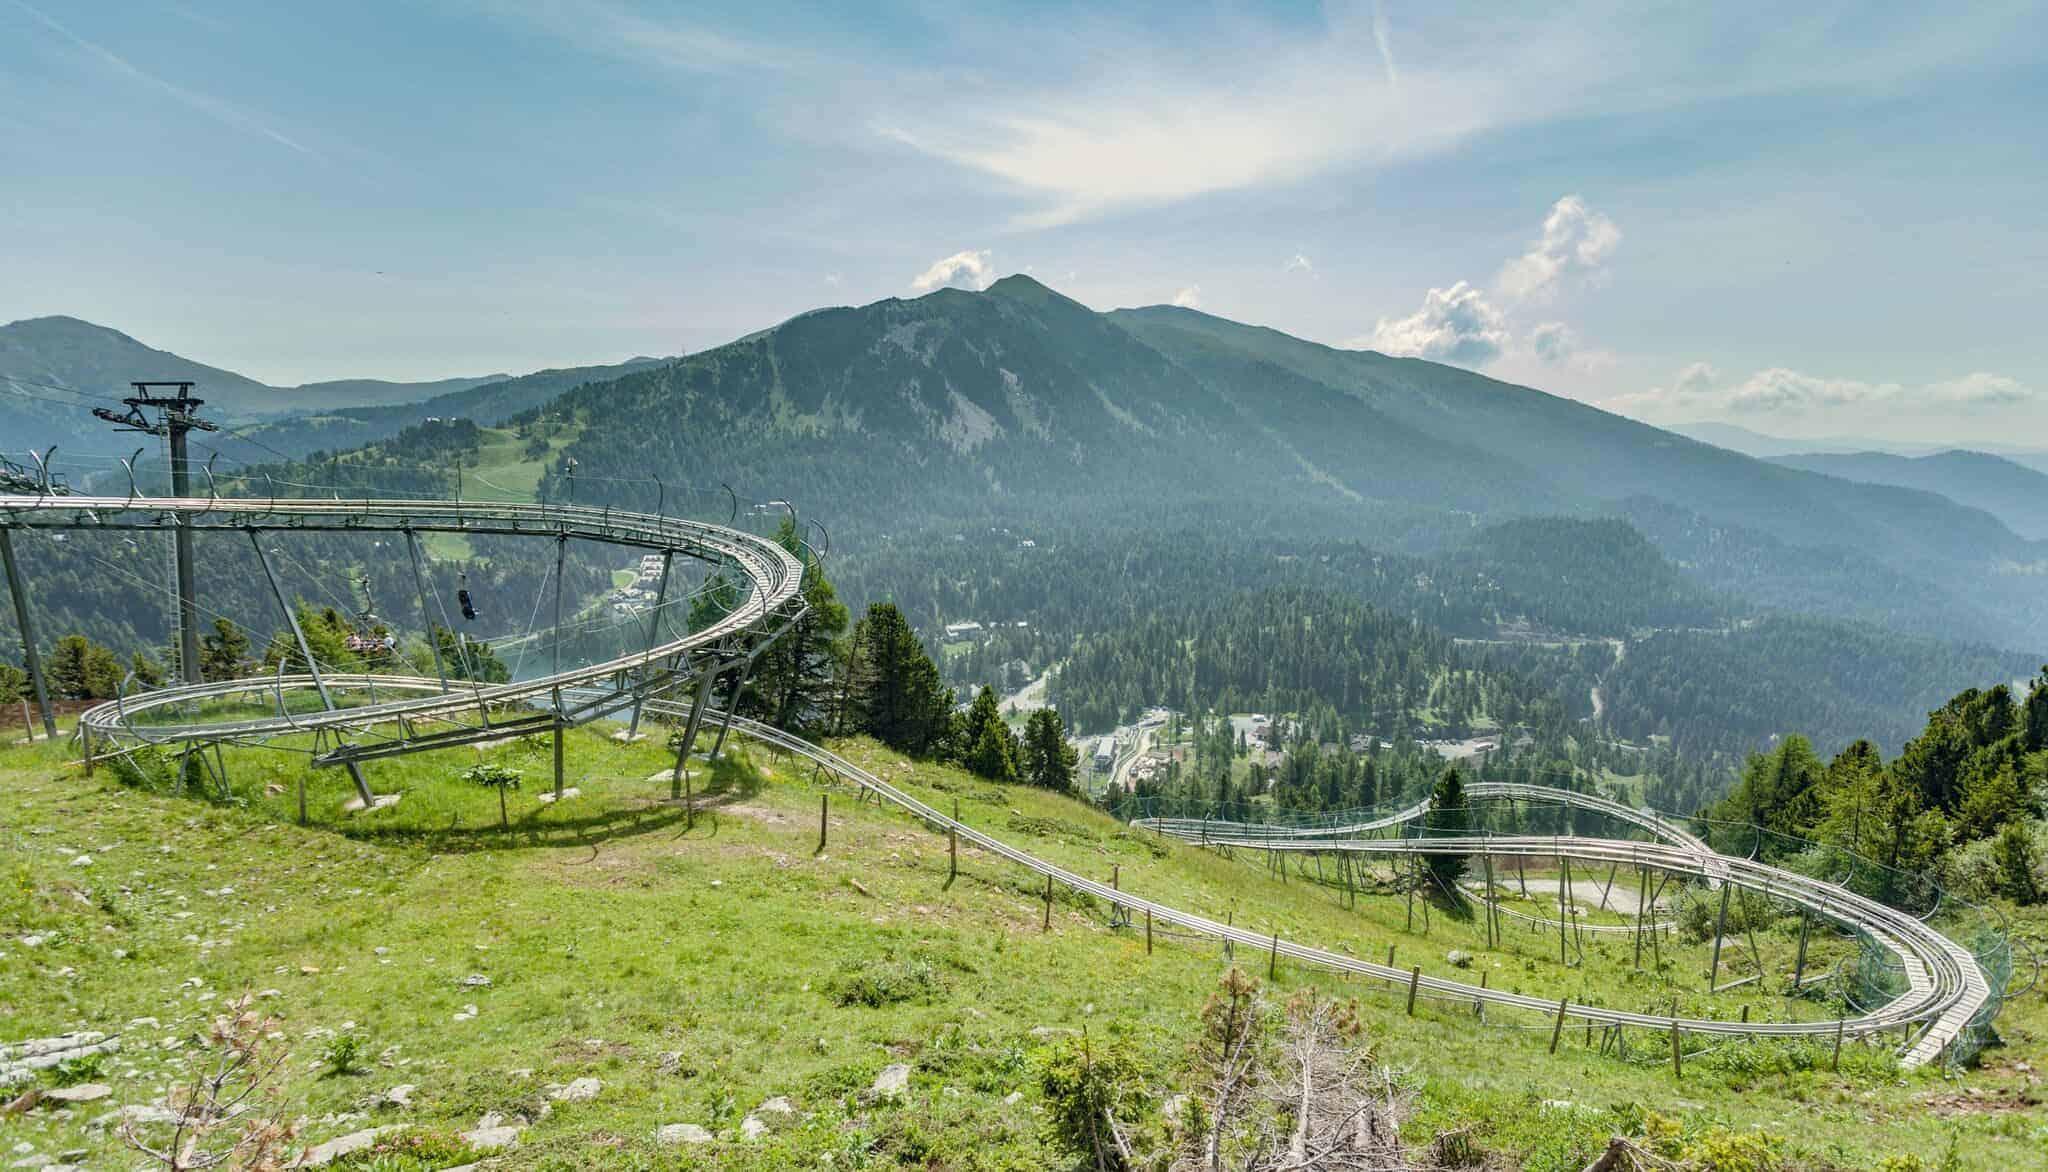 Rodelbahn Nocky Flitzer Turracher Höhe in Kärnten & Steiermark